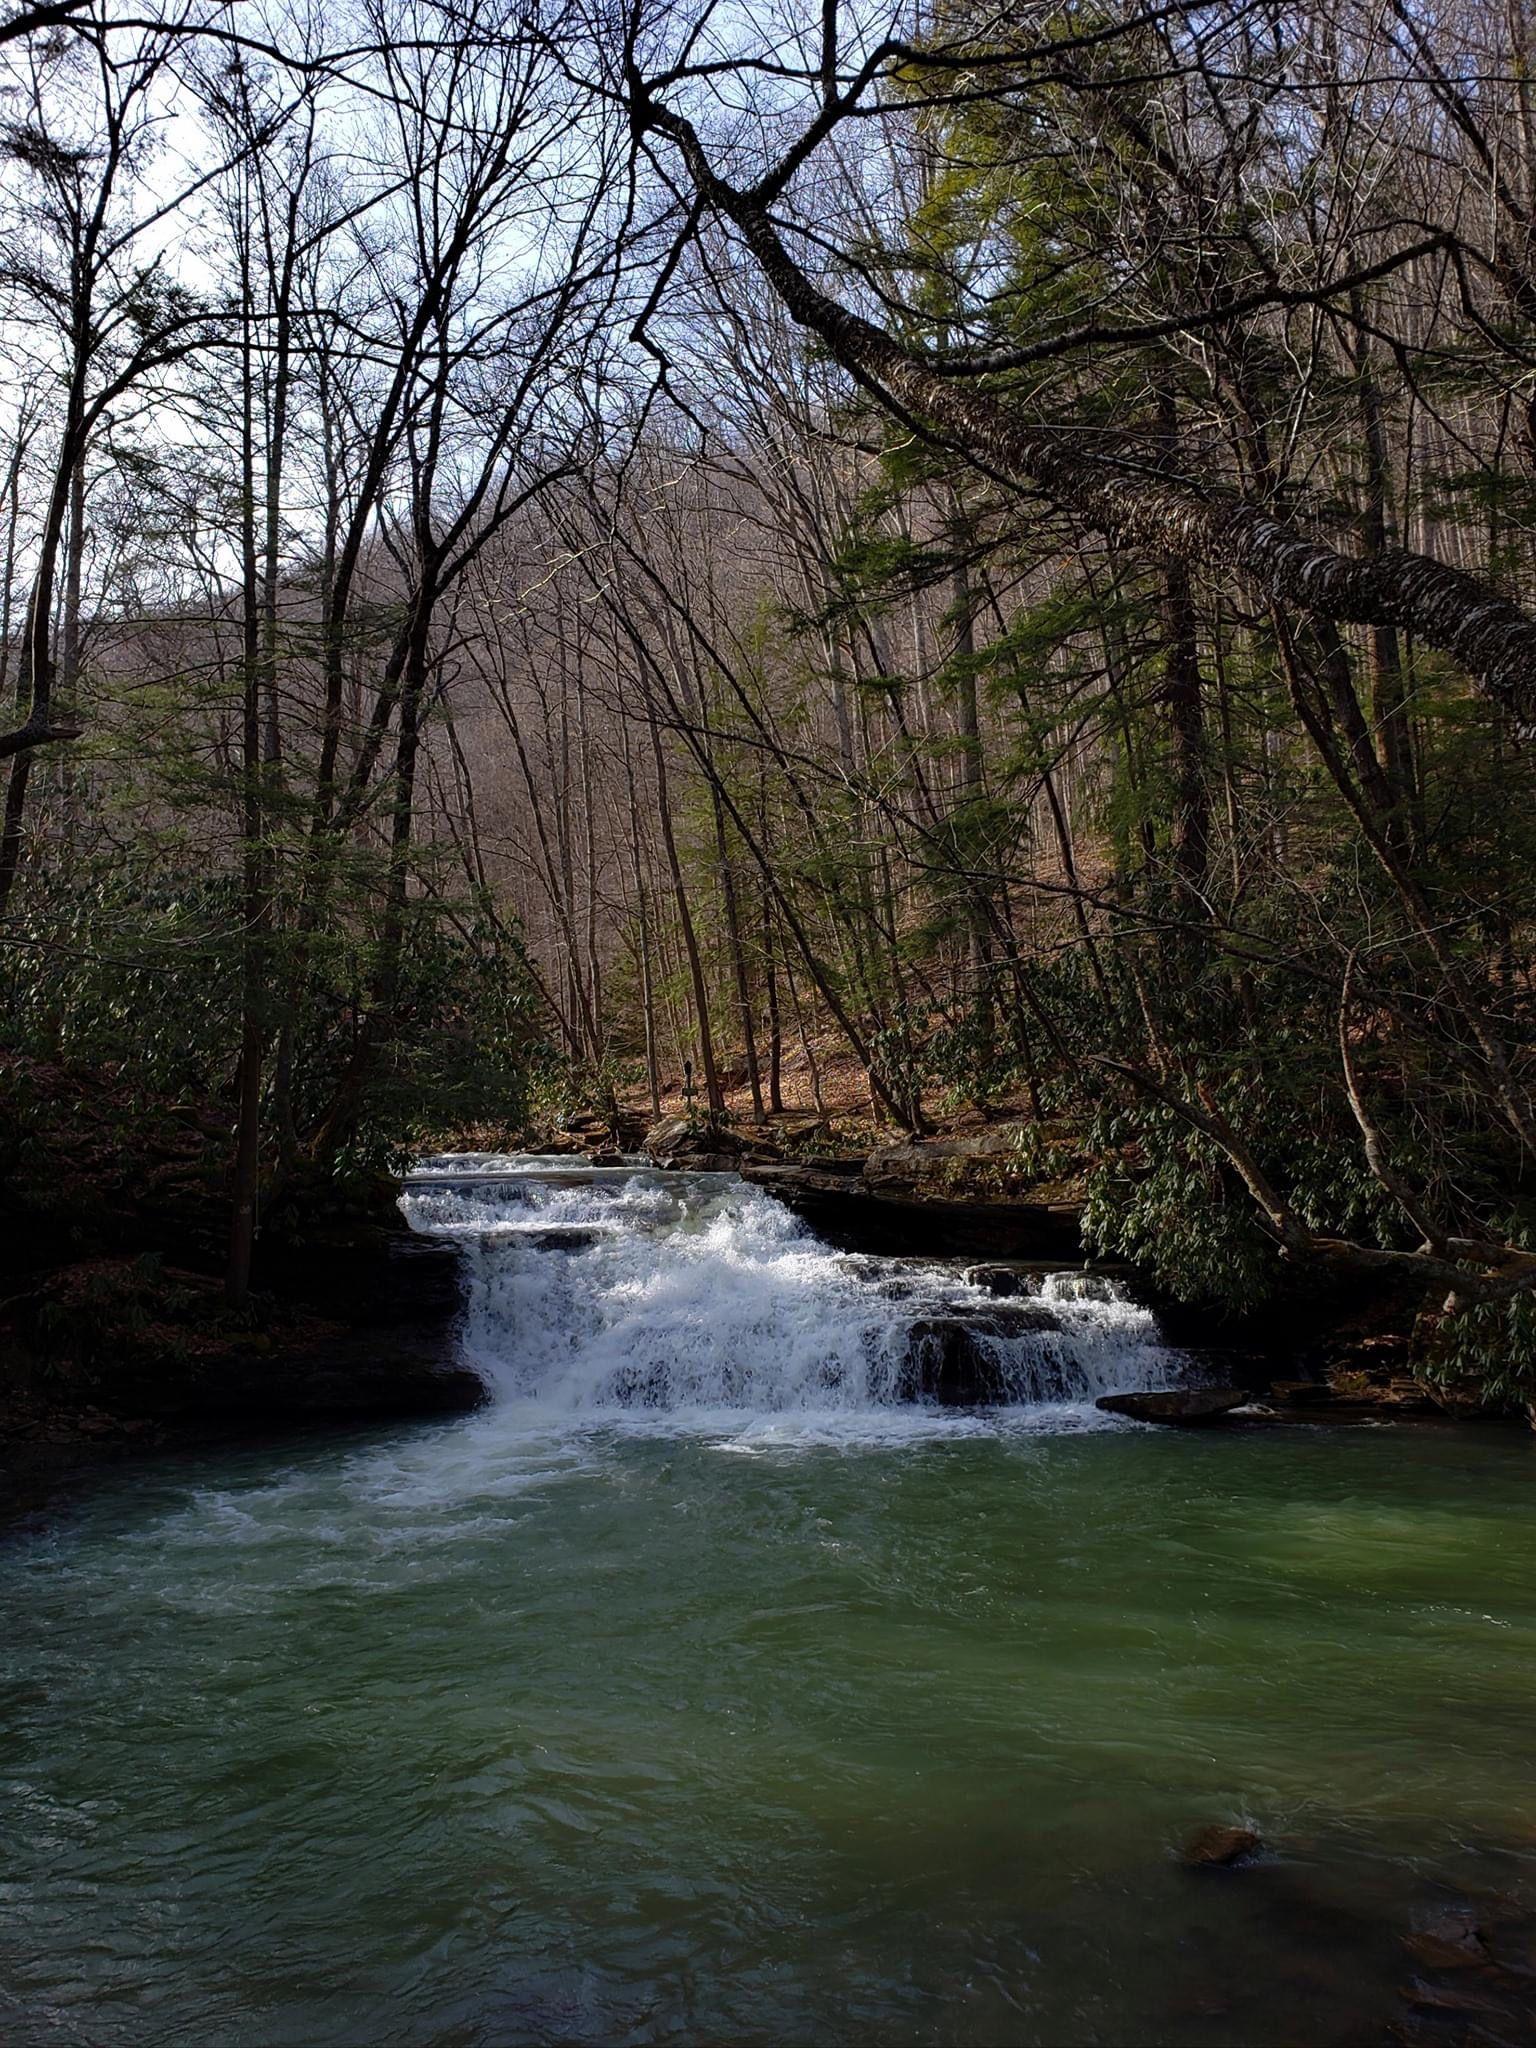 Pin by Micky Kraft on Wild, Wonderful, West Virginia!! in